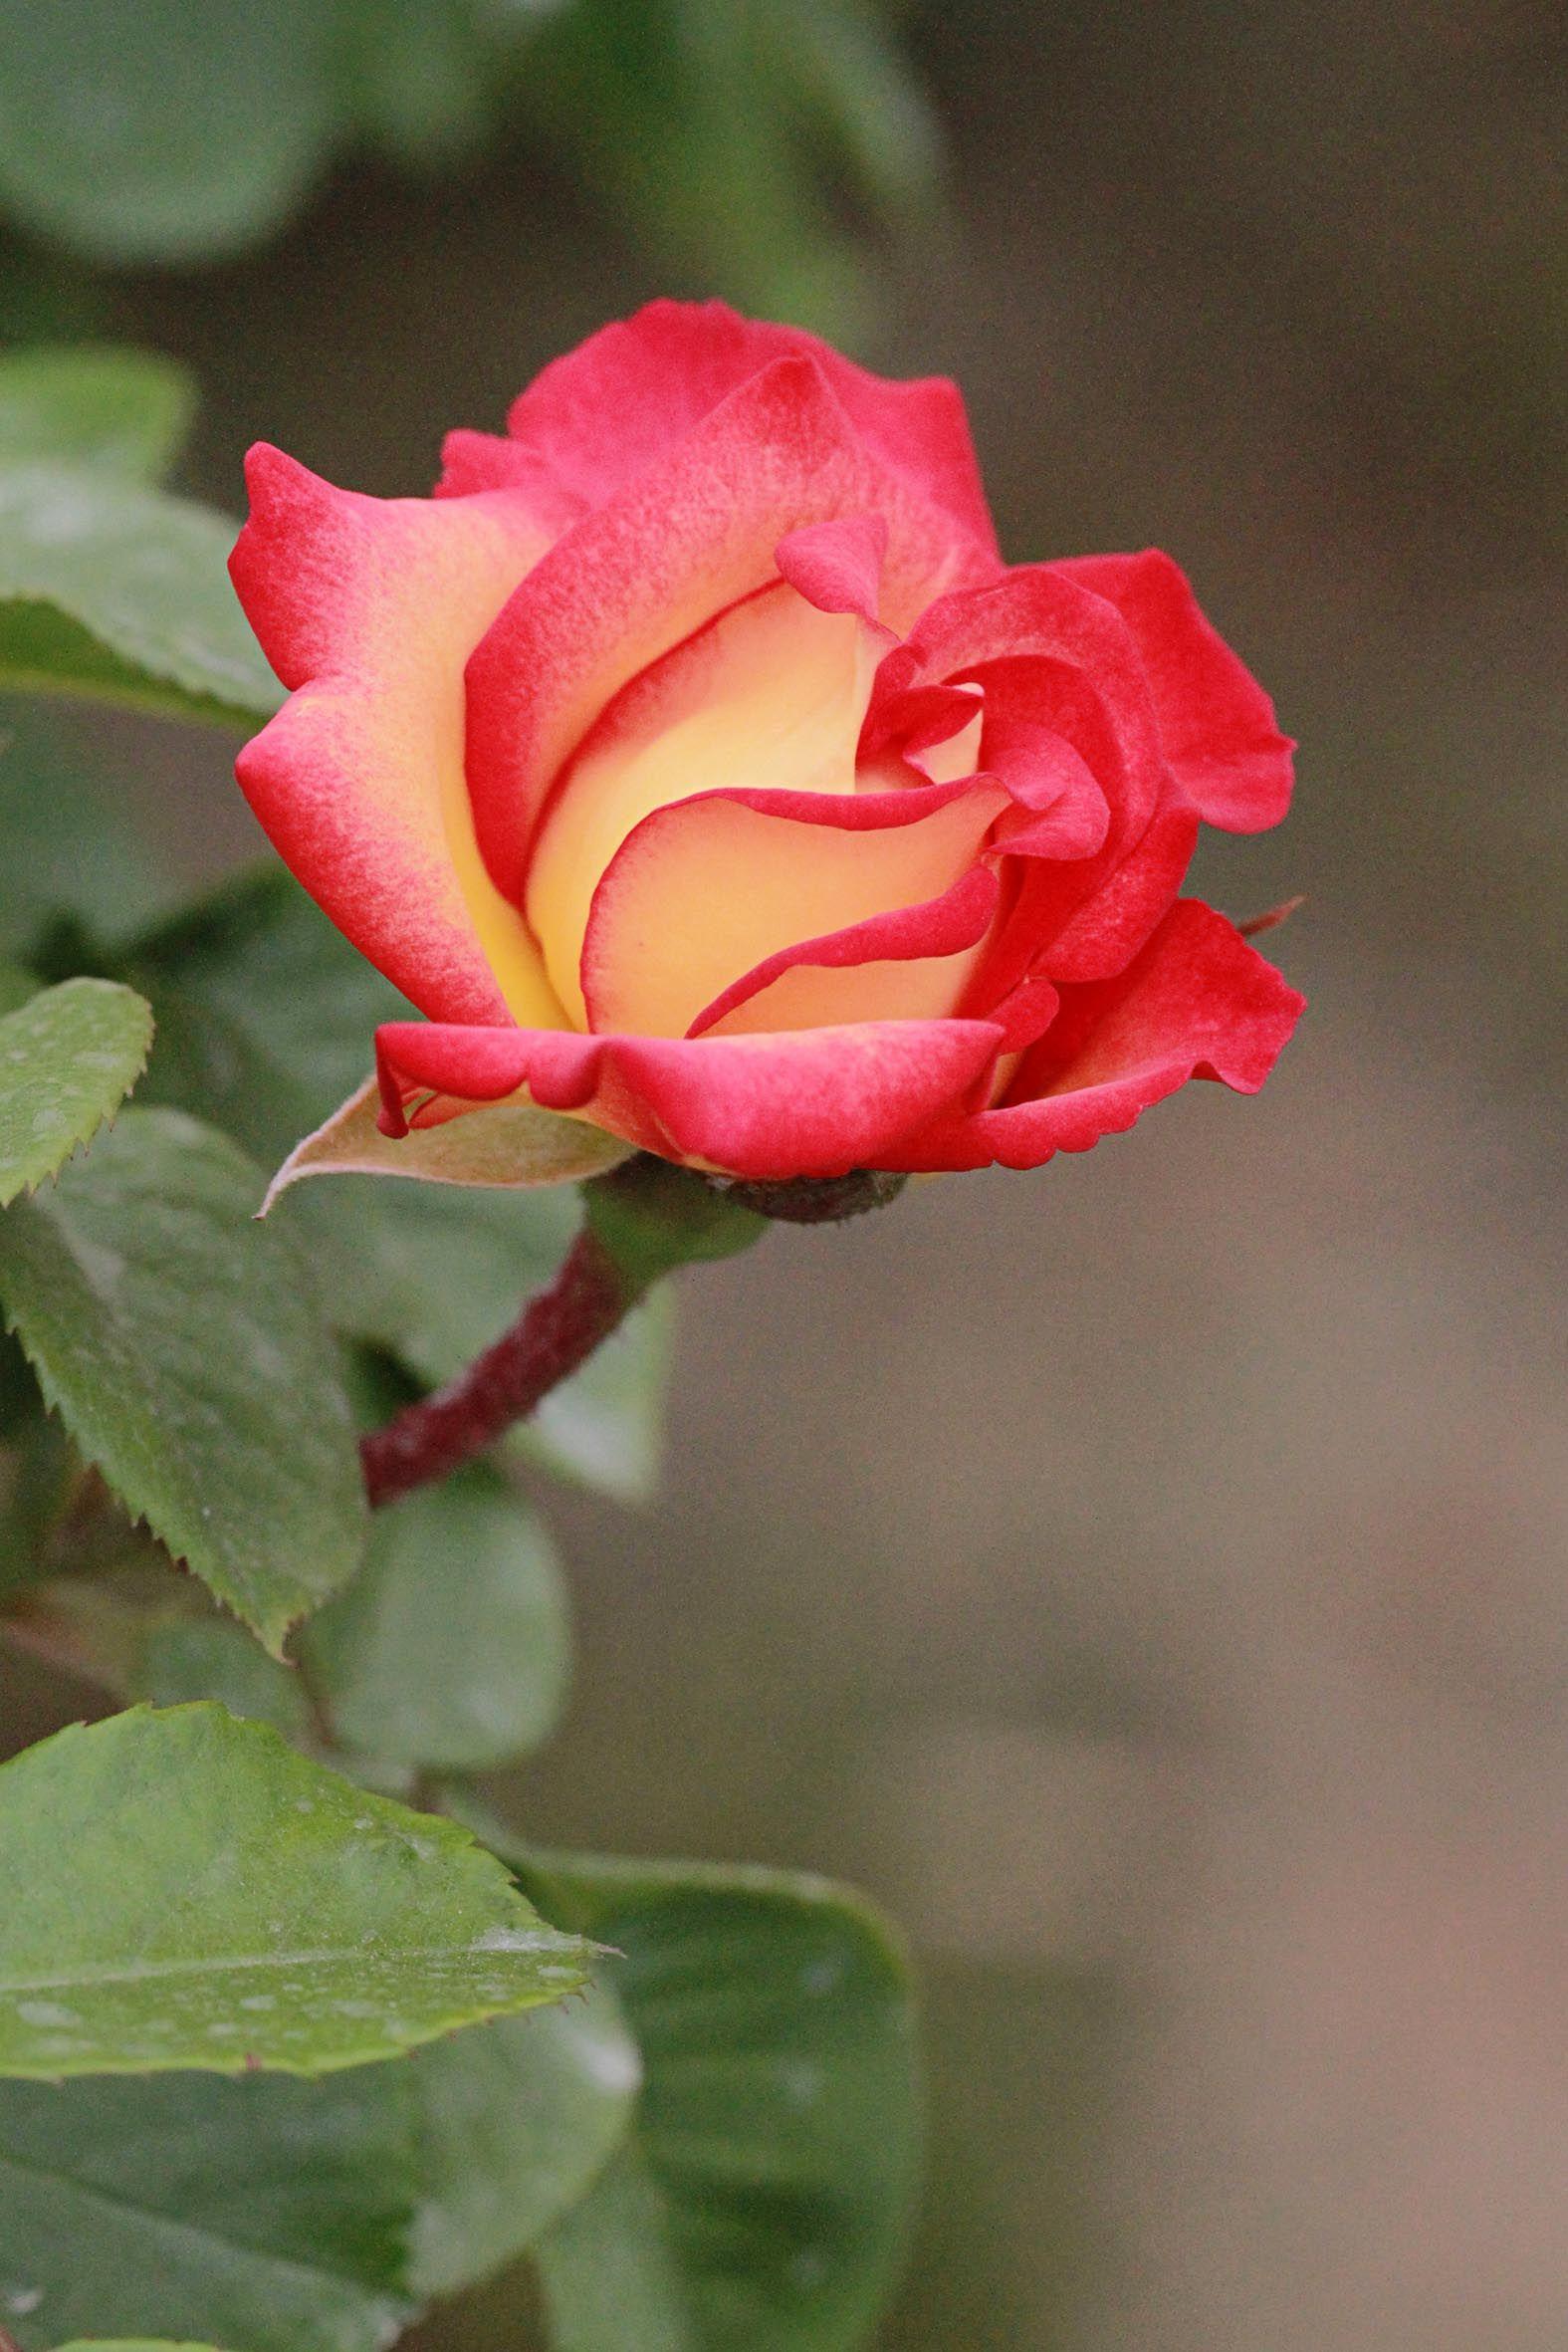 China Rose Beautiful Flowers Amazing Flowers Love Rose Images